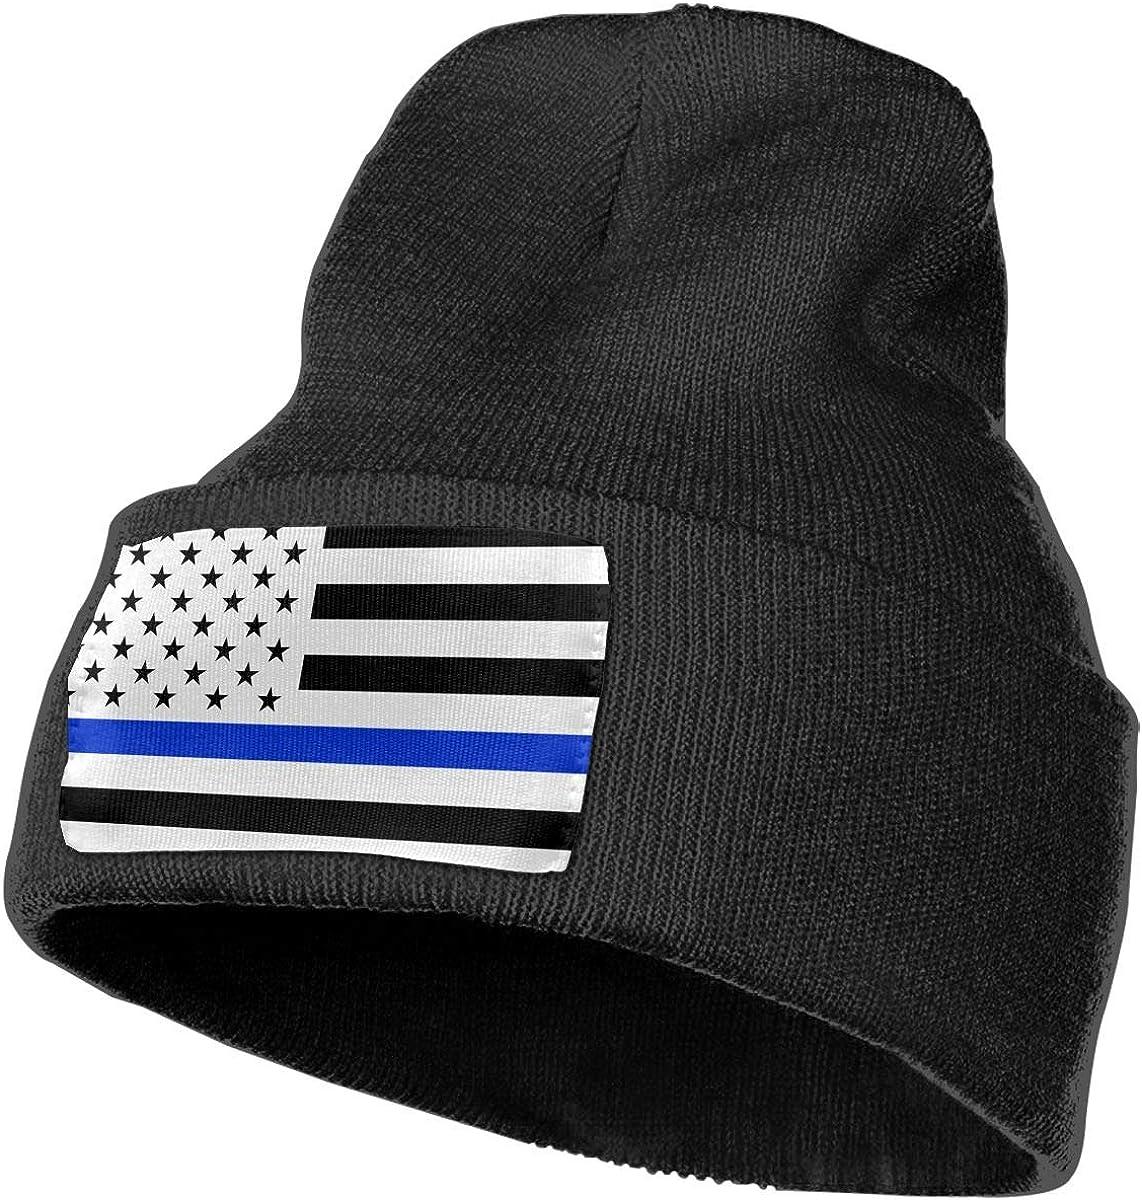 Sheery Blue Thin Line Flag Casual Knit Cap for Men Women 100/% Acrylic Acid Skull Cap Woolen Hat